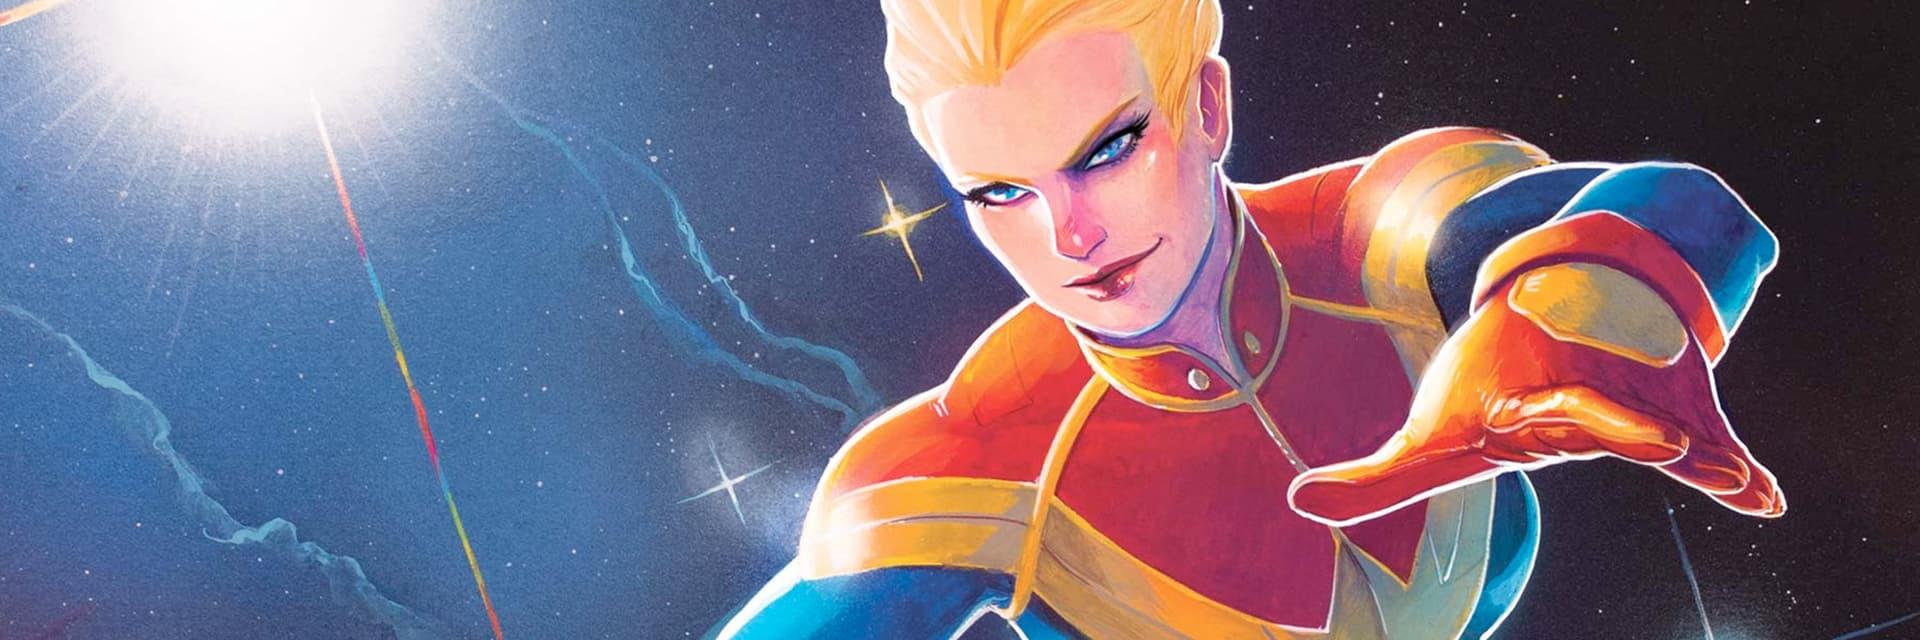 Captain Marvel (Carol Danvers) Powers, Abilities, Villains | Marvel